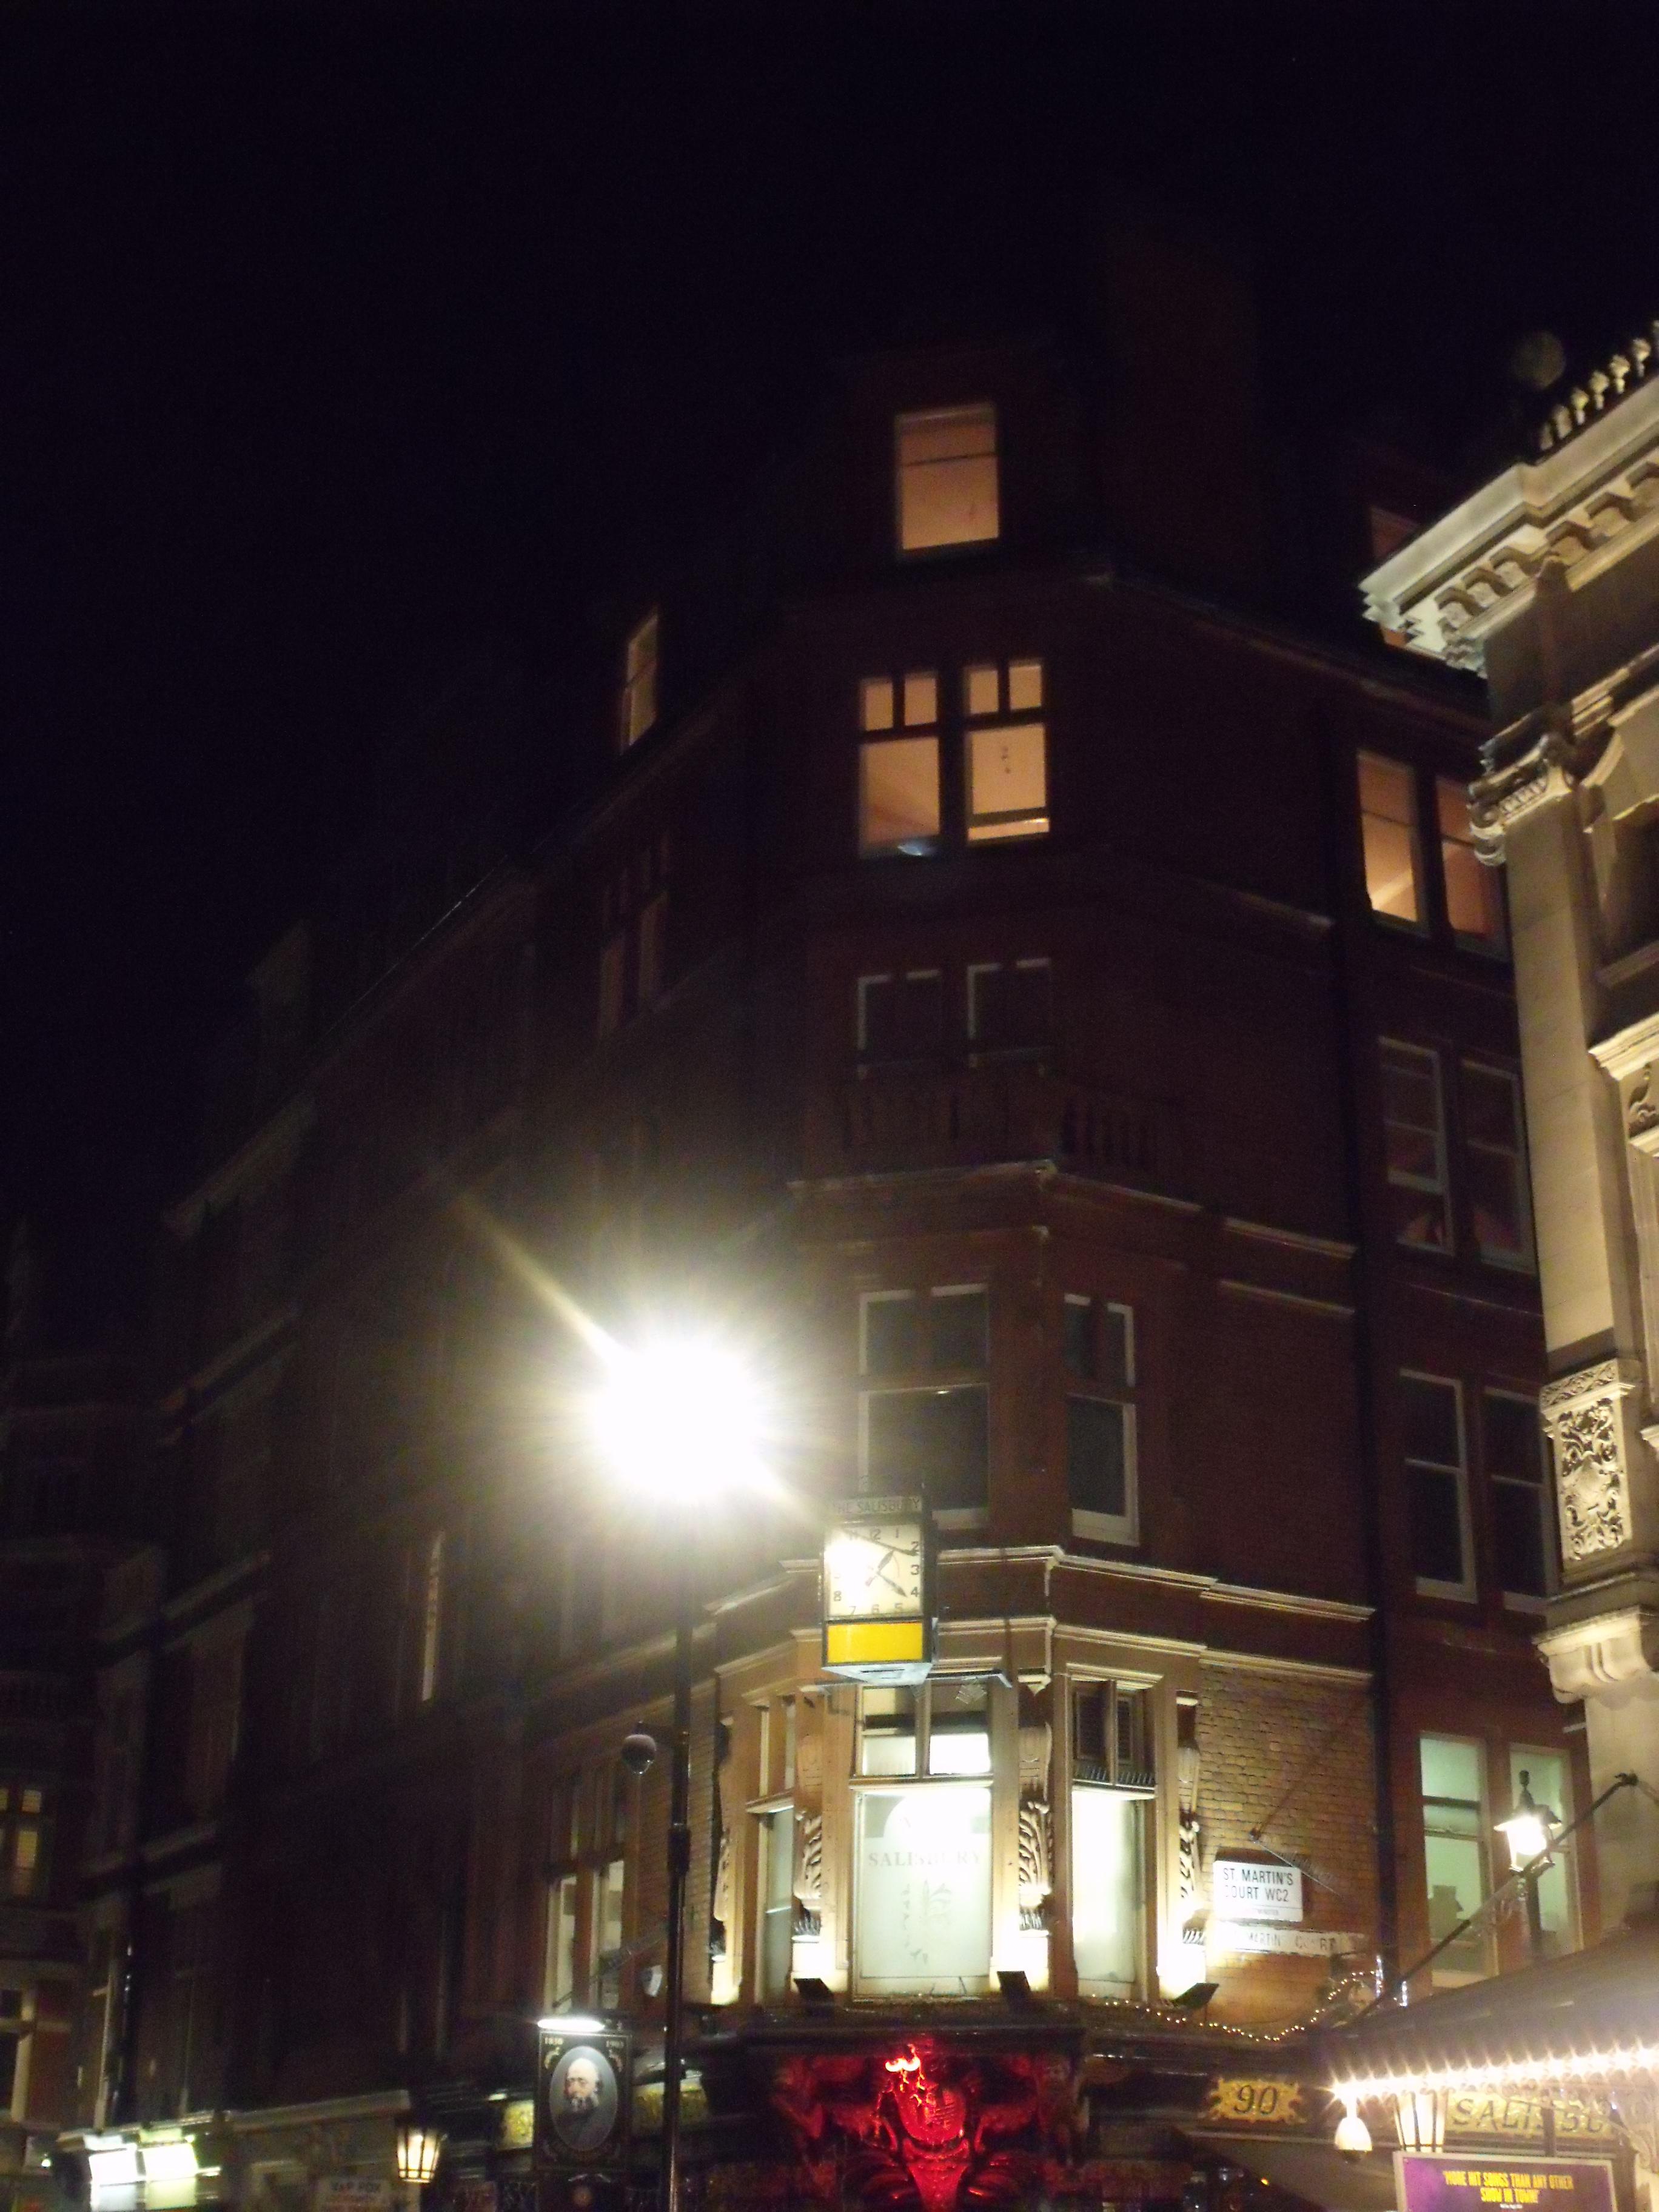 FileThe Salisbury And Noel Coward Theatre